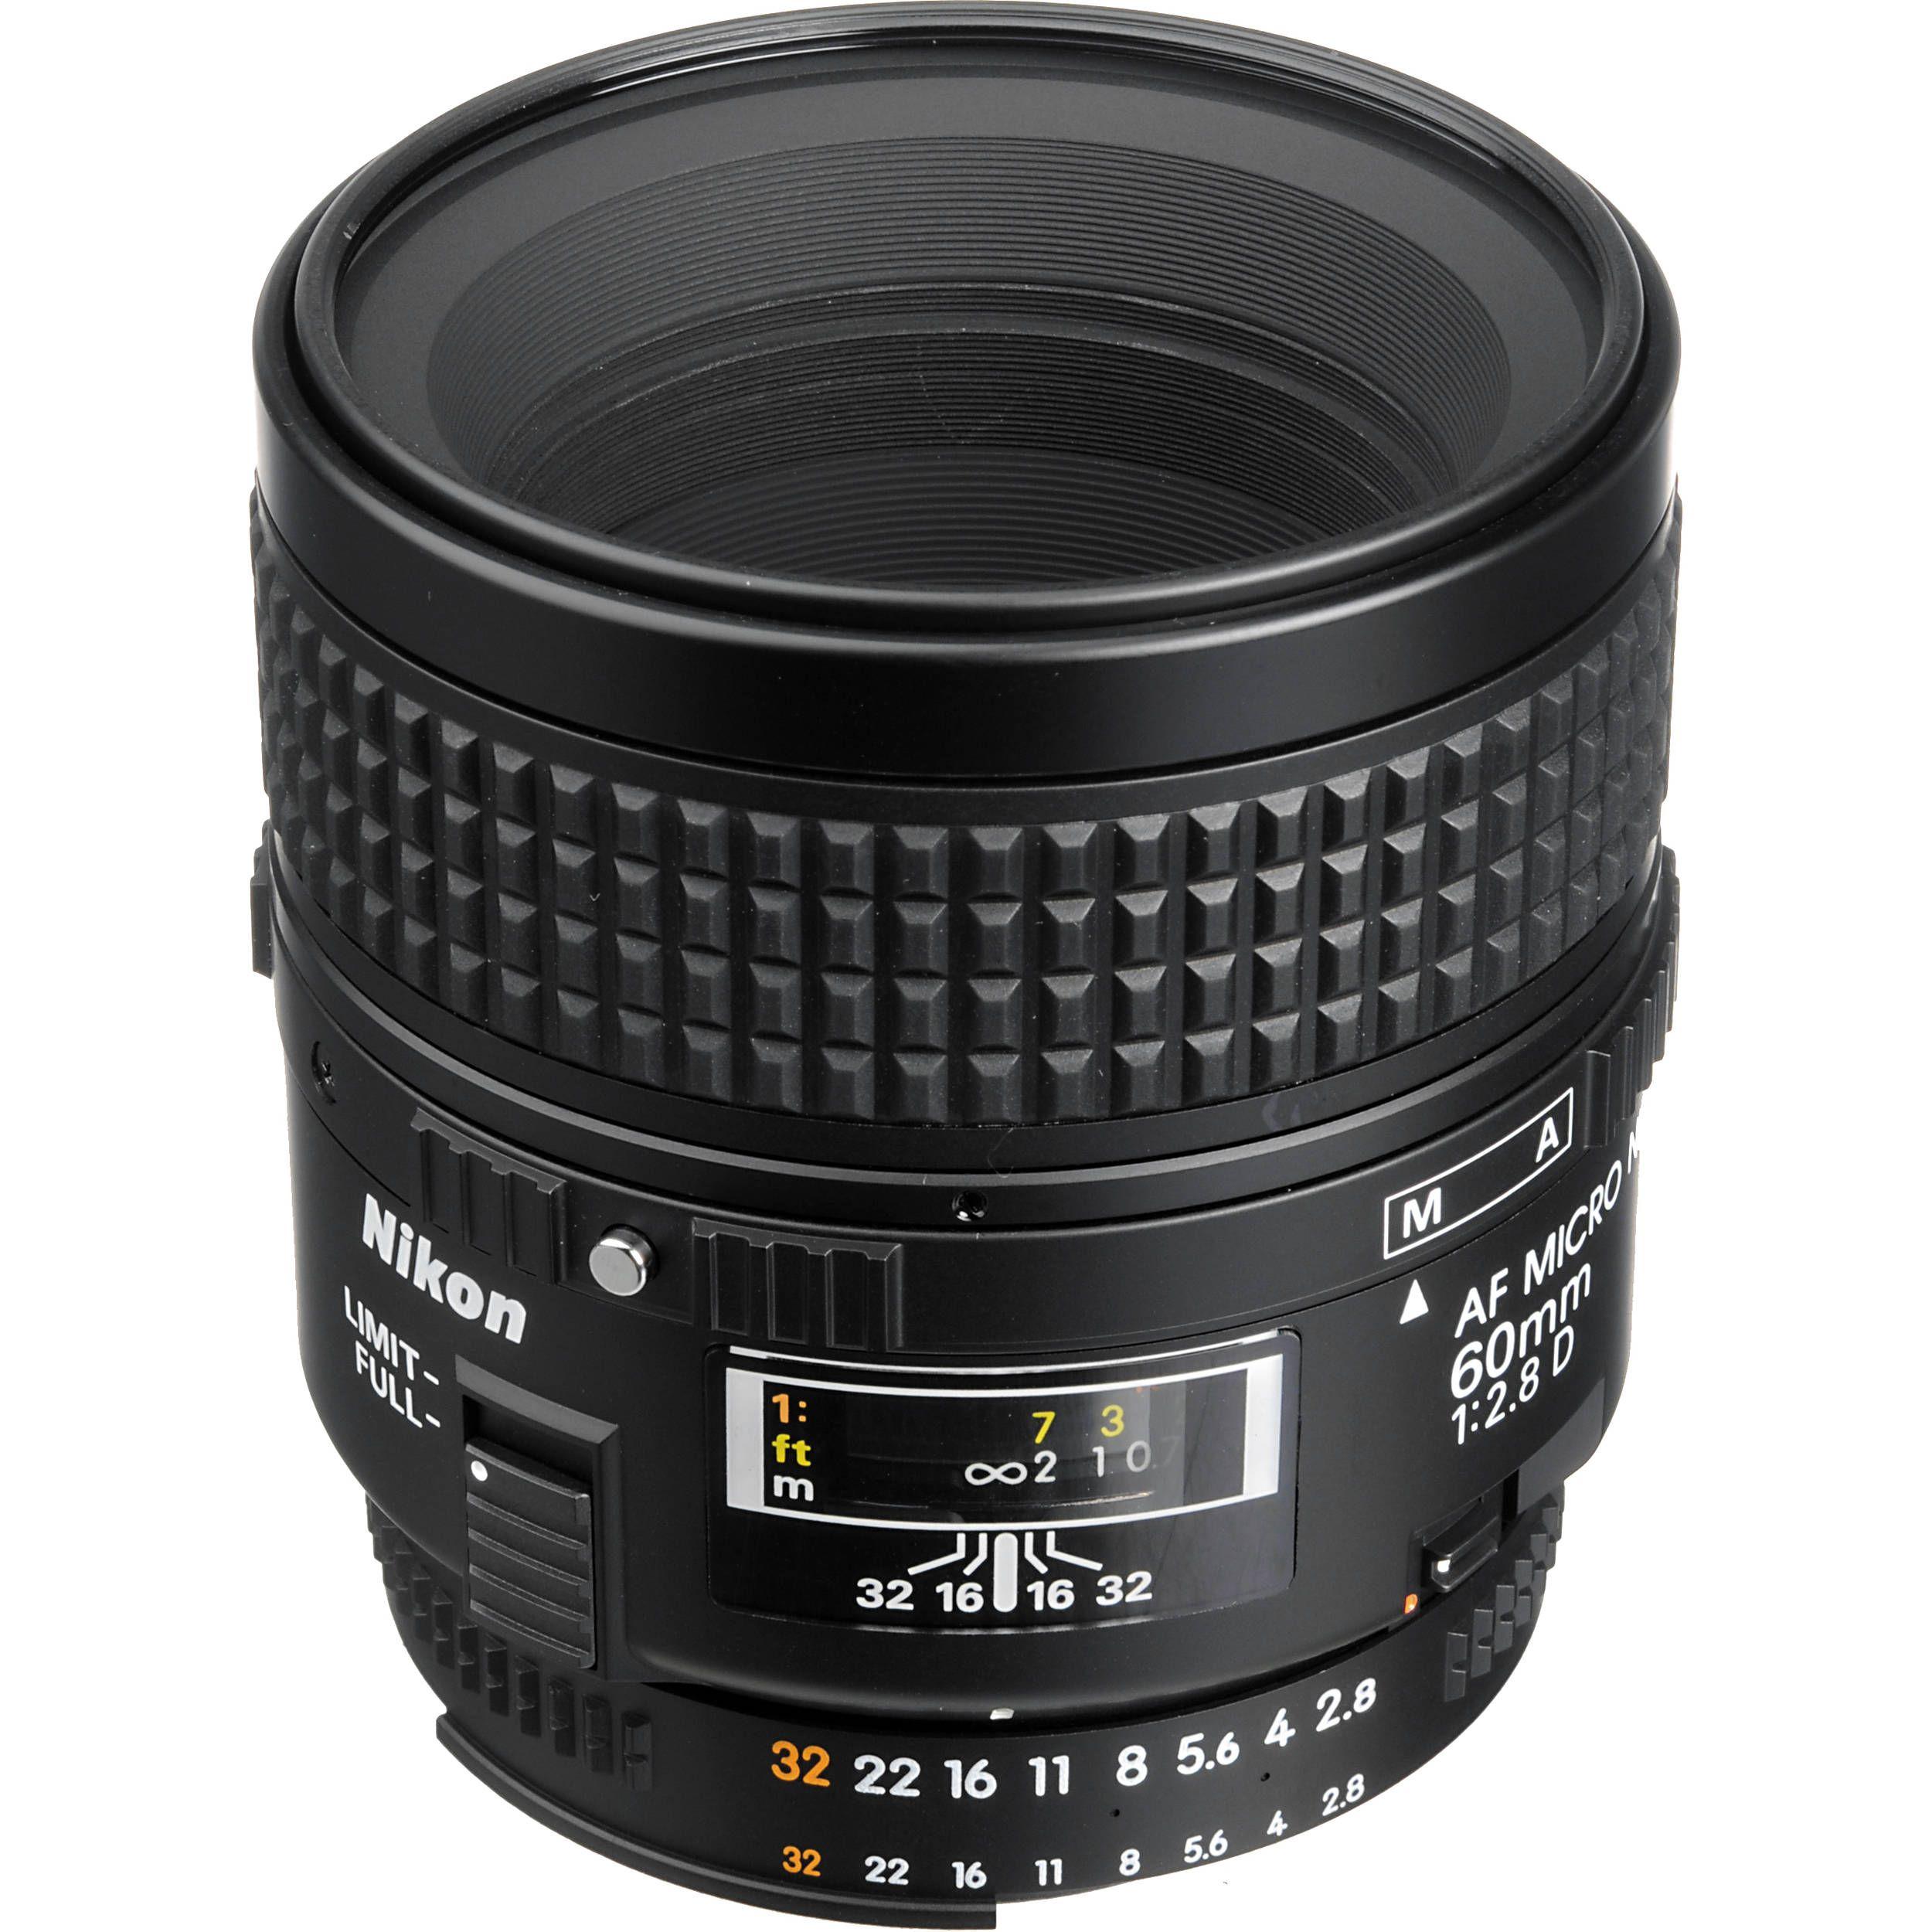 Nikon Af Micro Nikkor 60mm F 2 8d Lens Nikon Lenses Nikon Dslr Camera Nikon